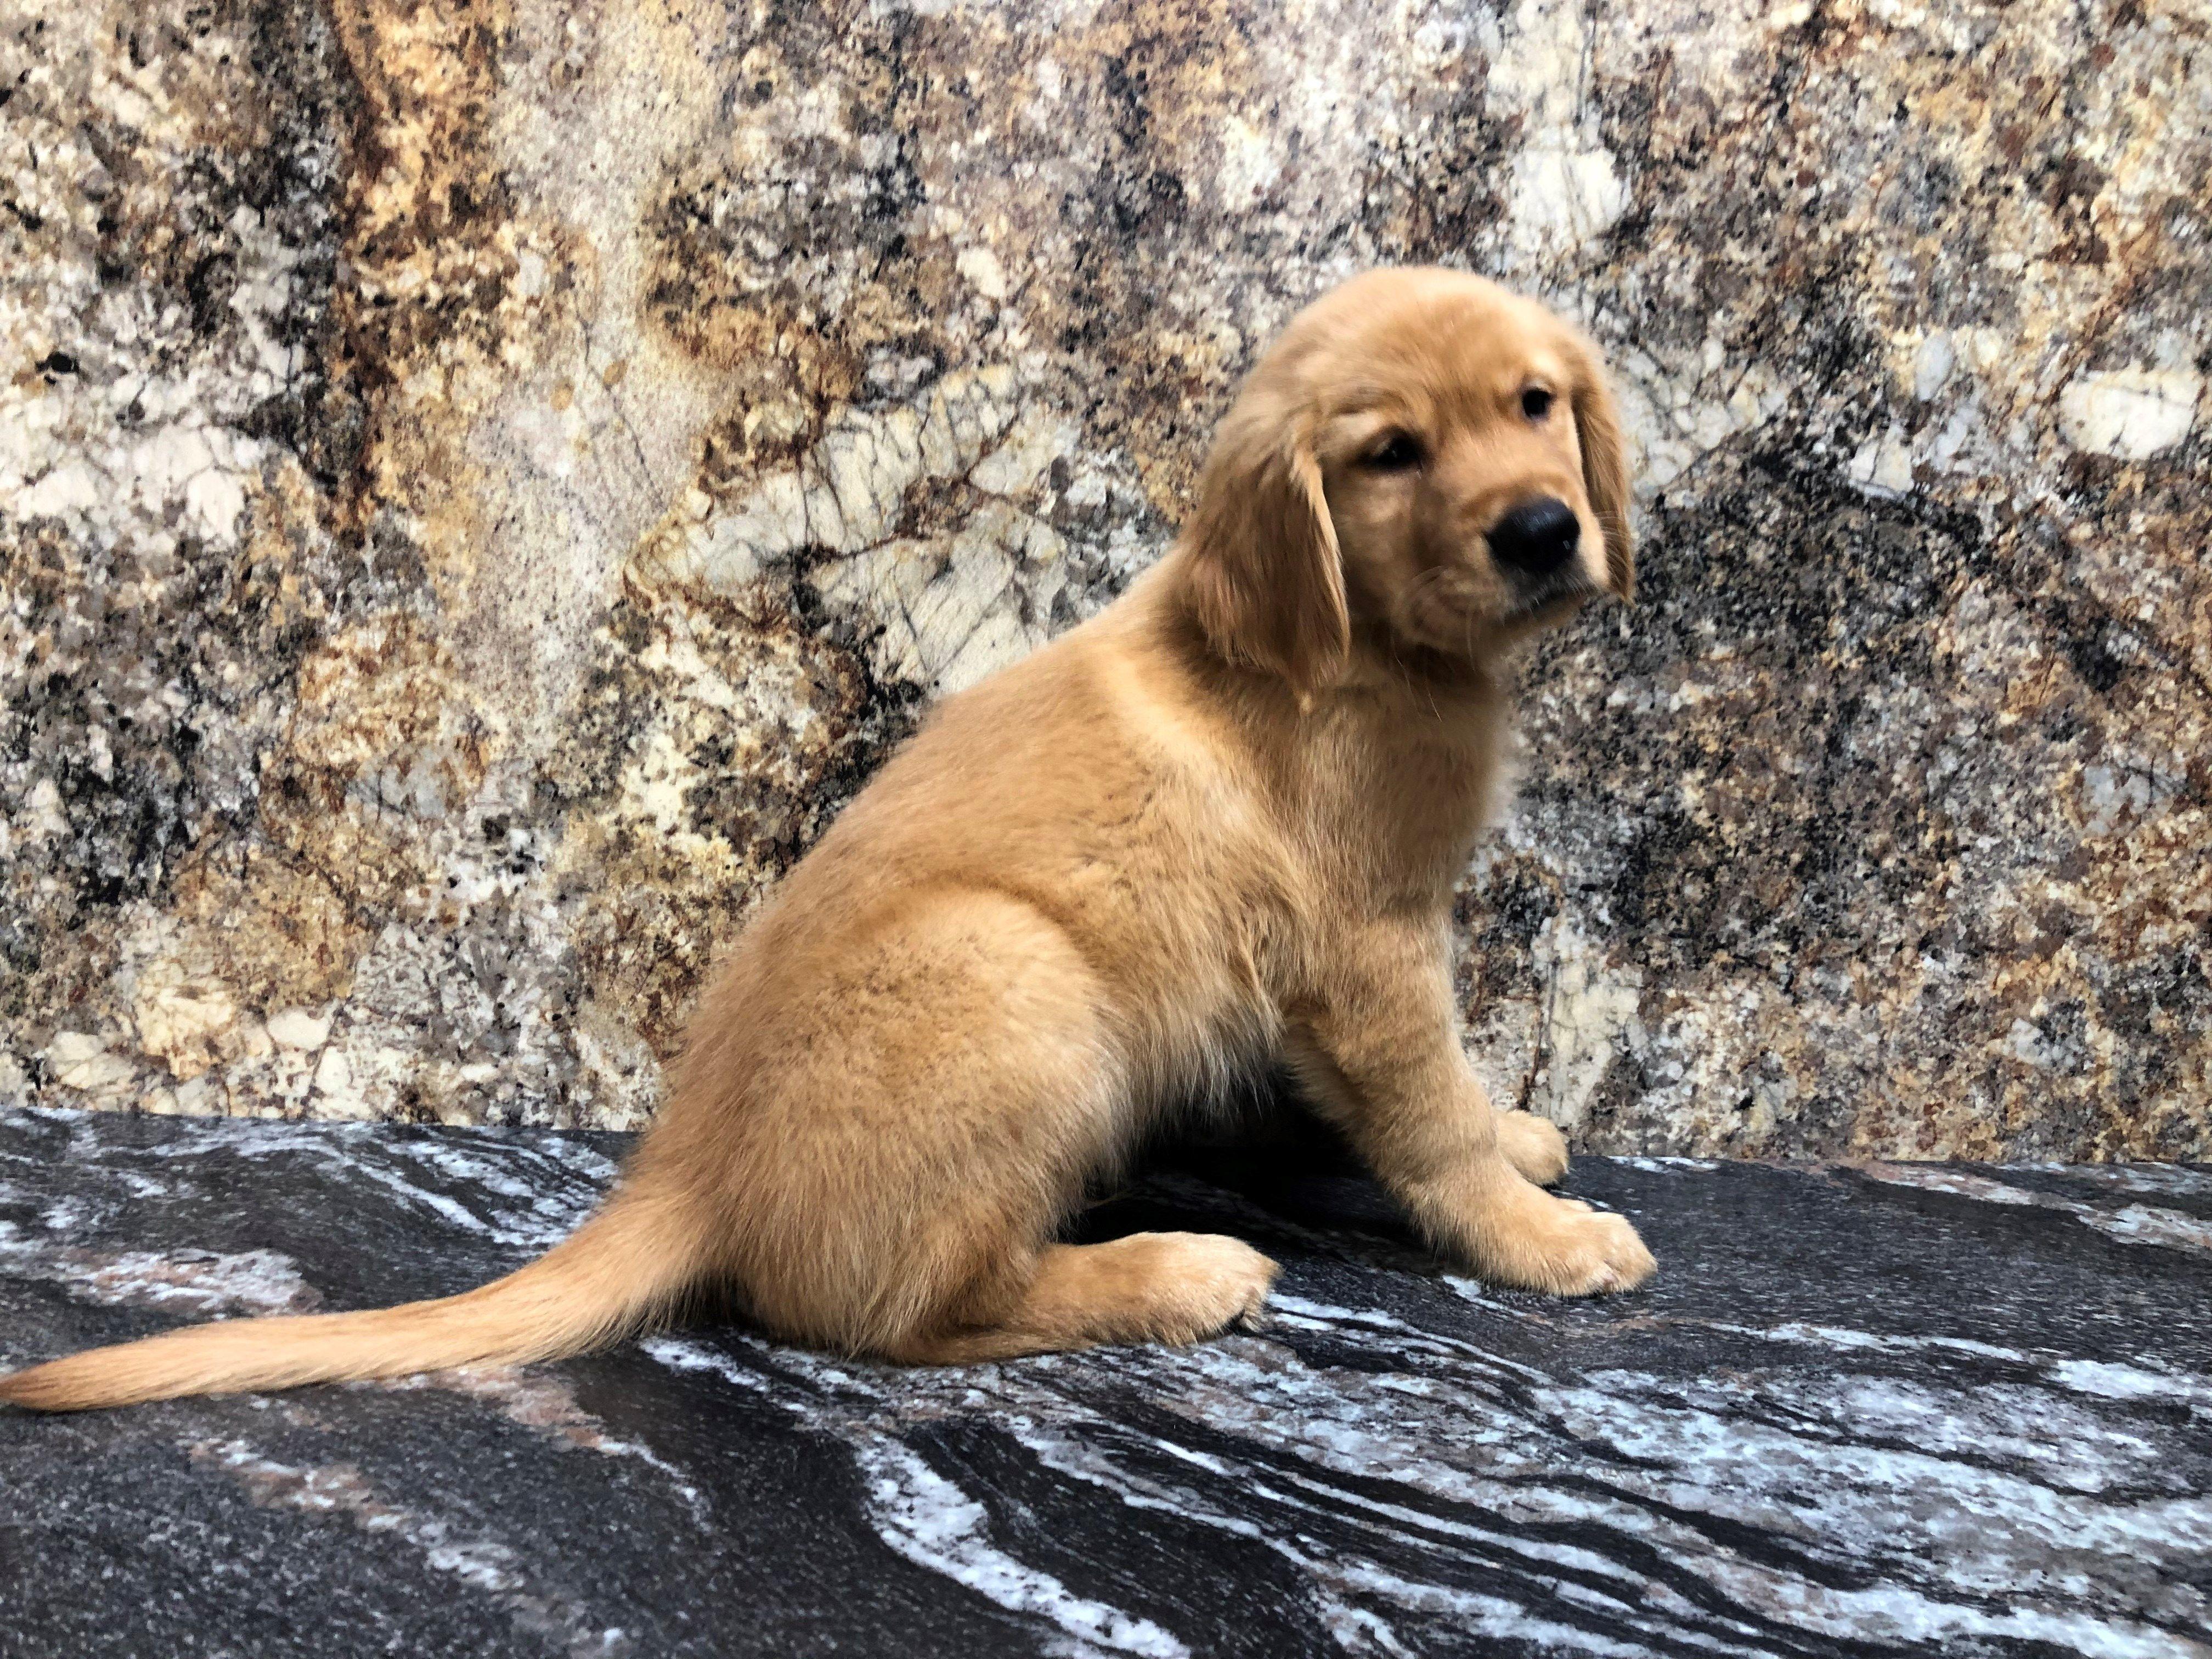 Petland Kansas City has Golden Retriever puppies for sale